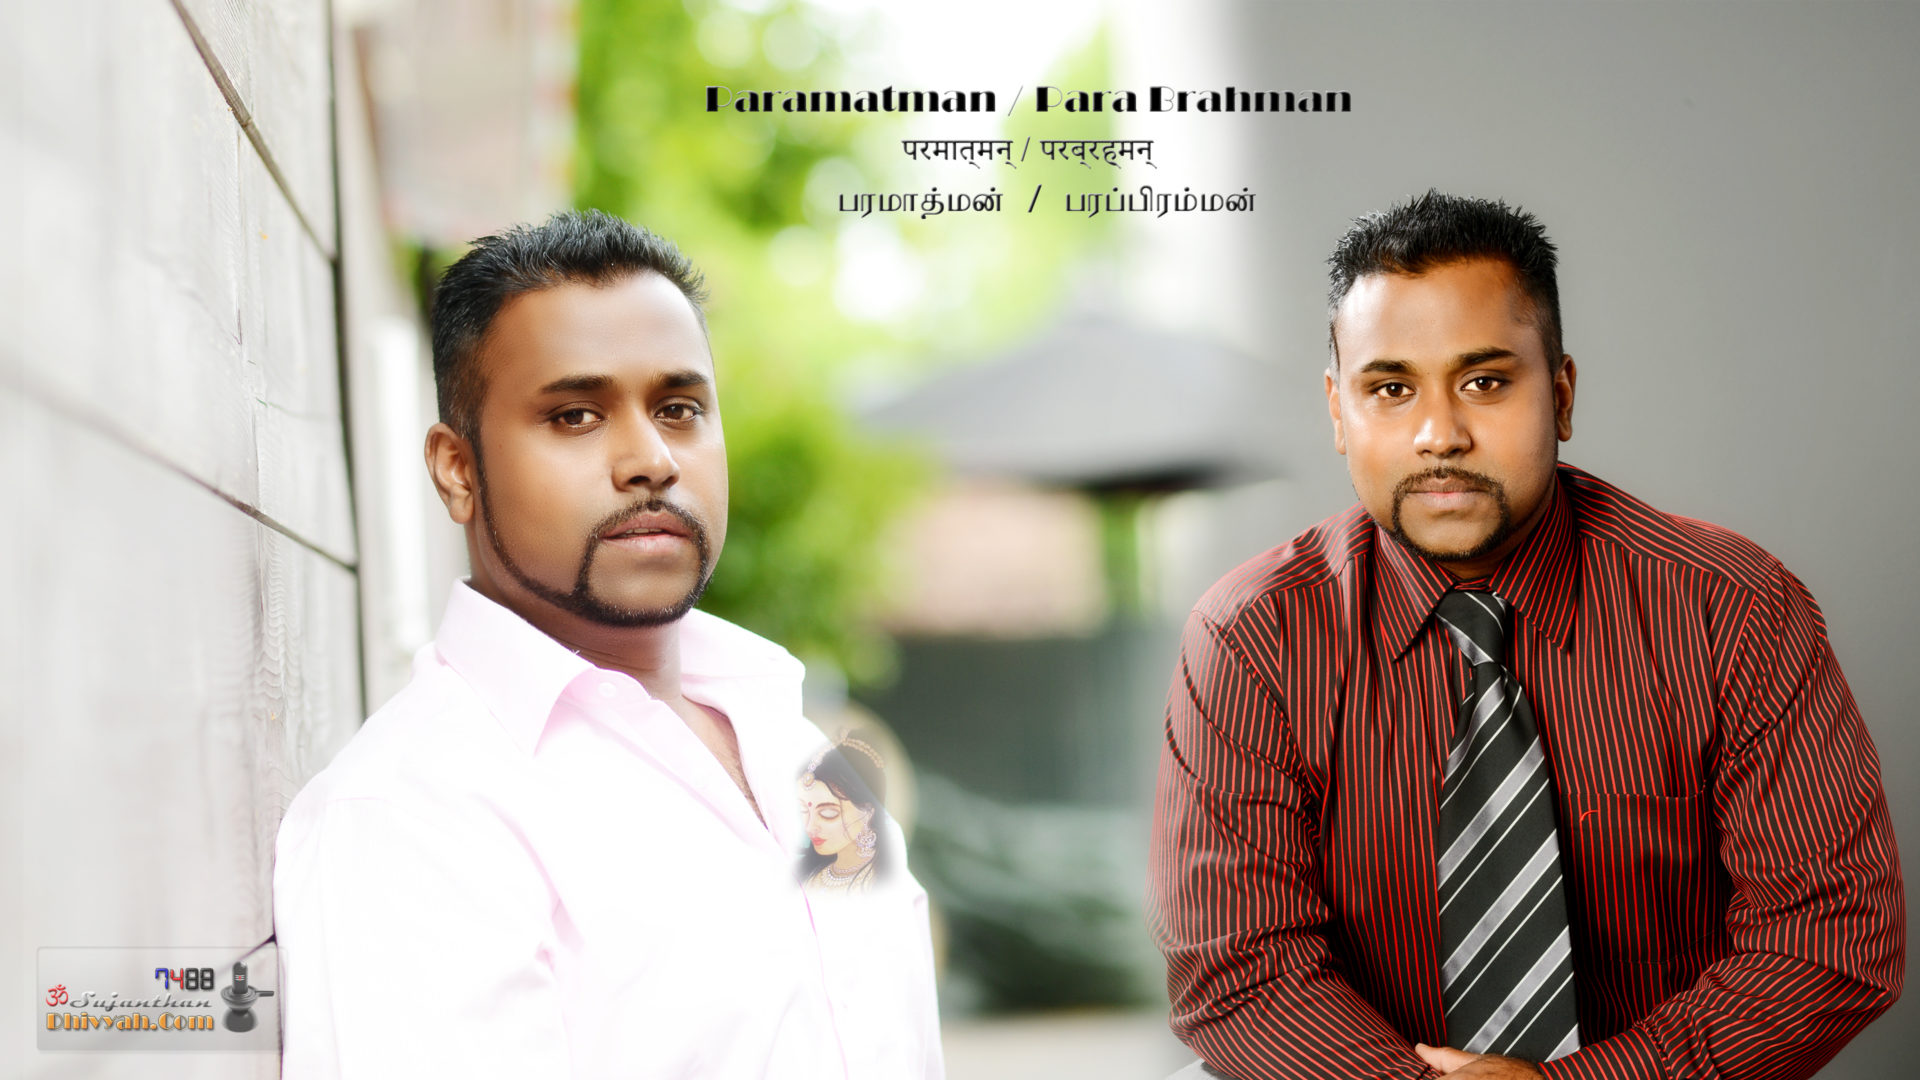 Paramatman or Para Brahman